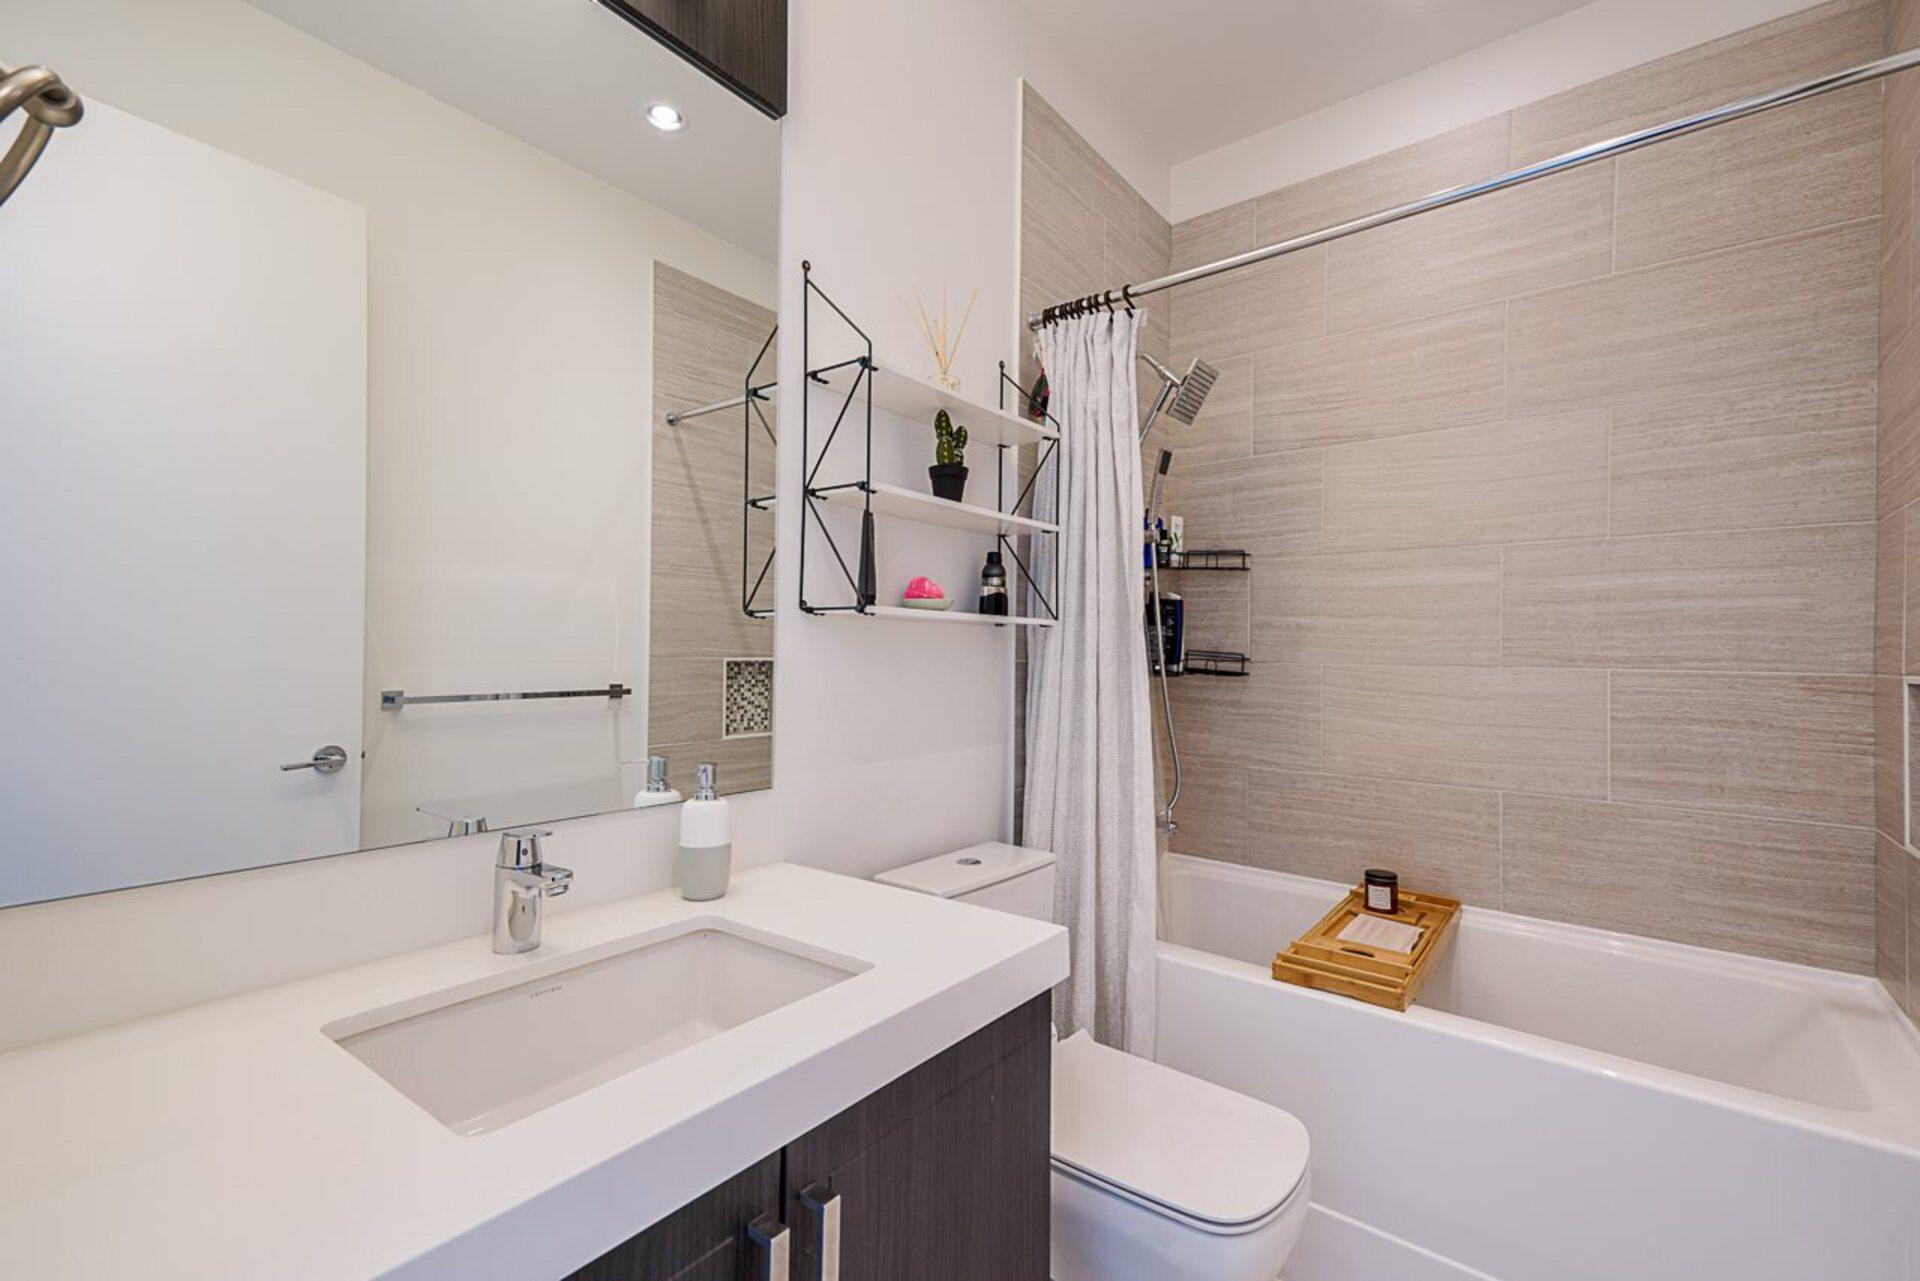 403 - 2393 Ranger Lane Bathroom  at 403 - 2393 Ranger Lane, Riverwood, Port Coquitlam